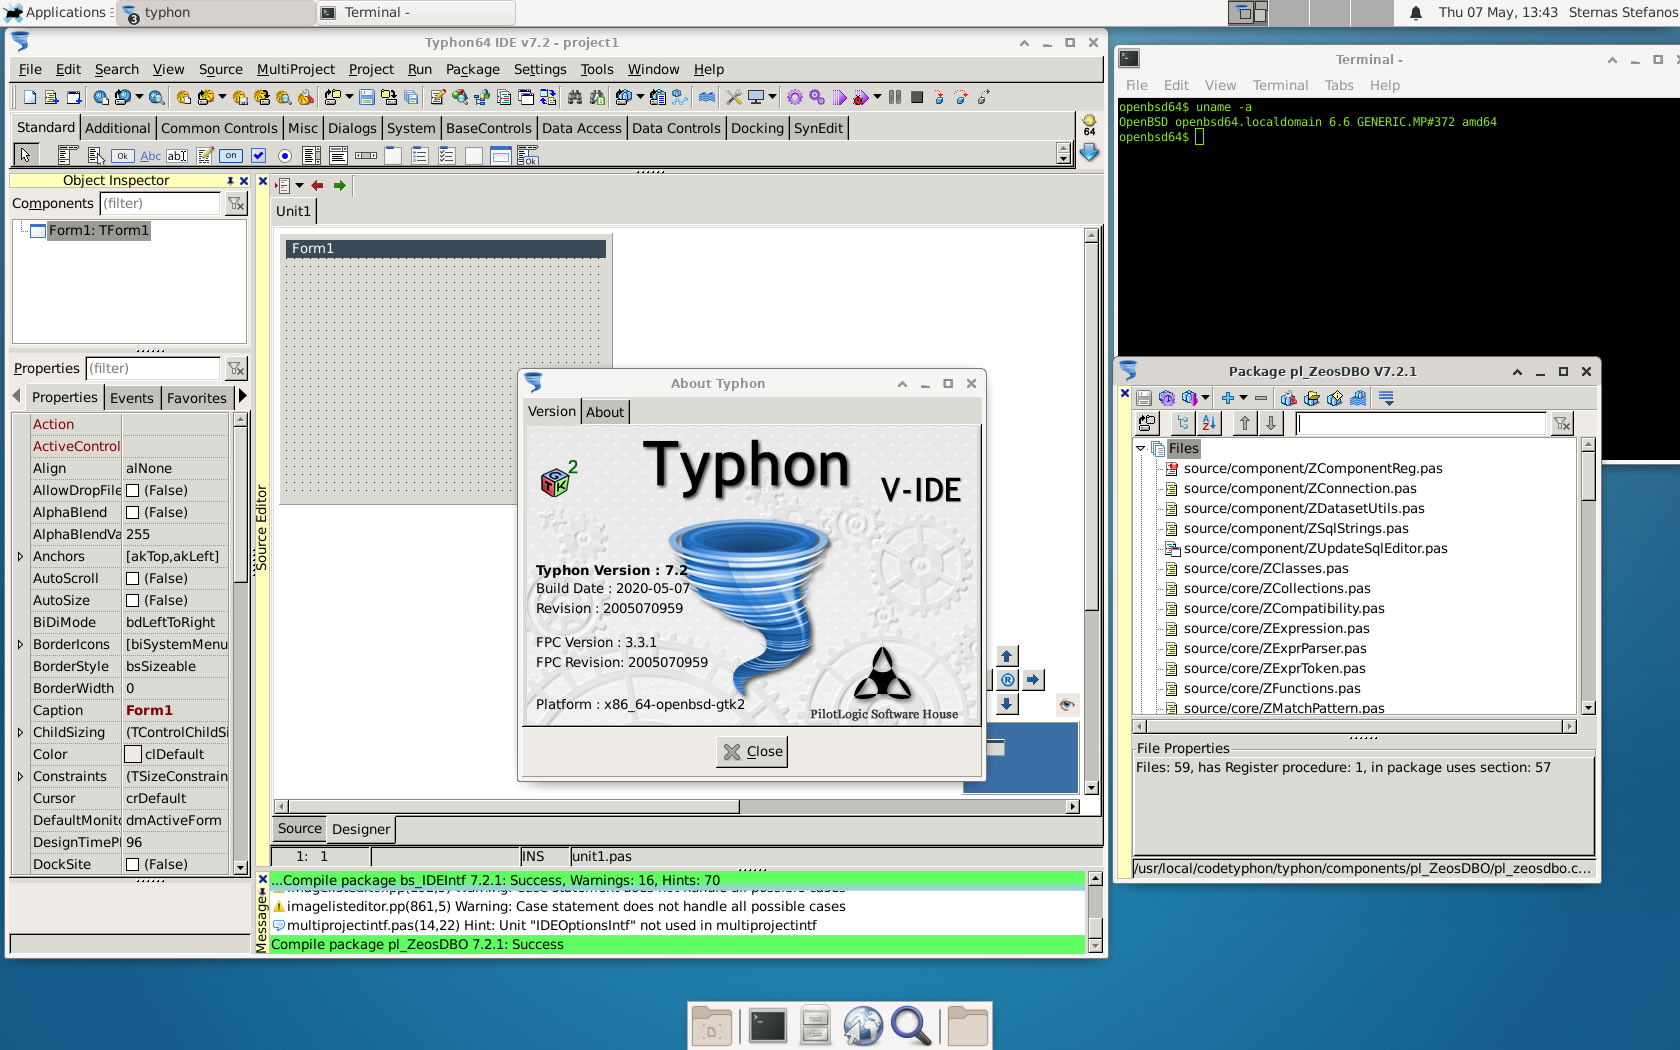 OpenBSD66-64-2020-05-07-1.jpg